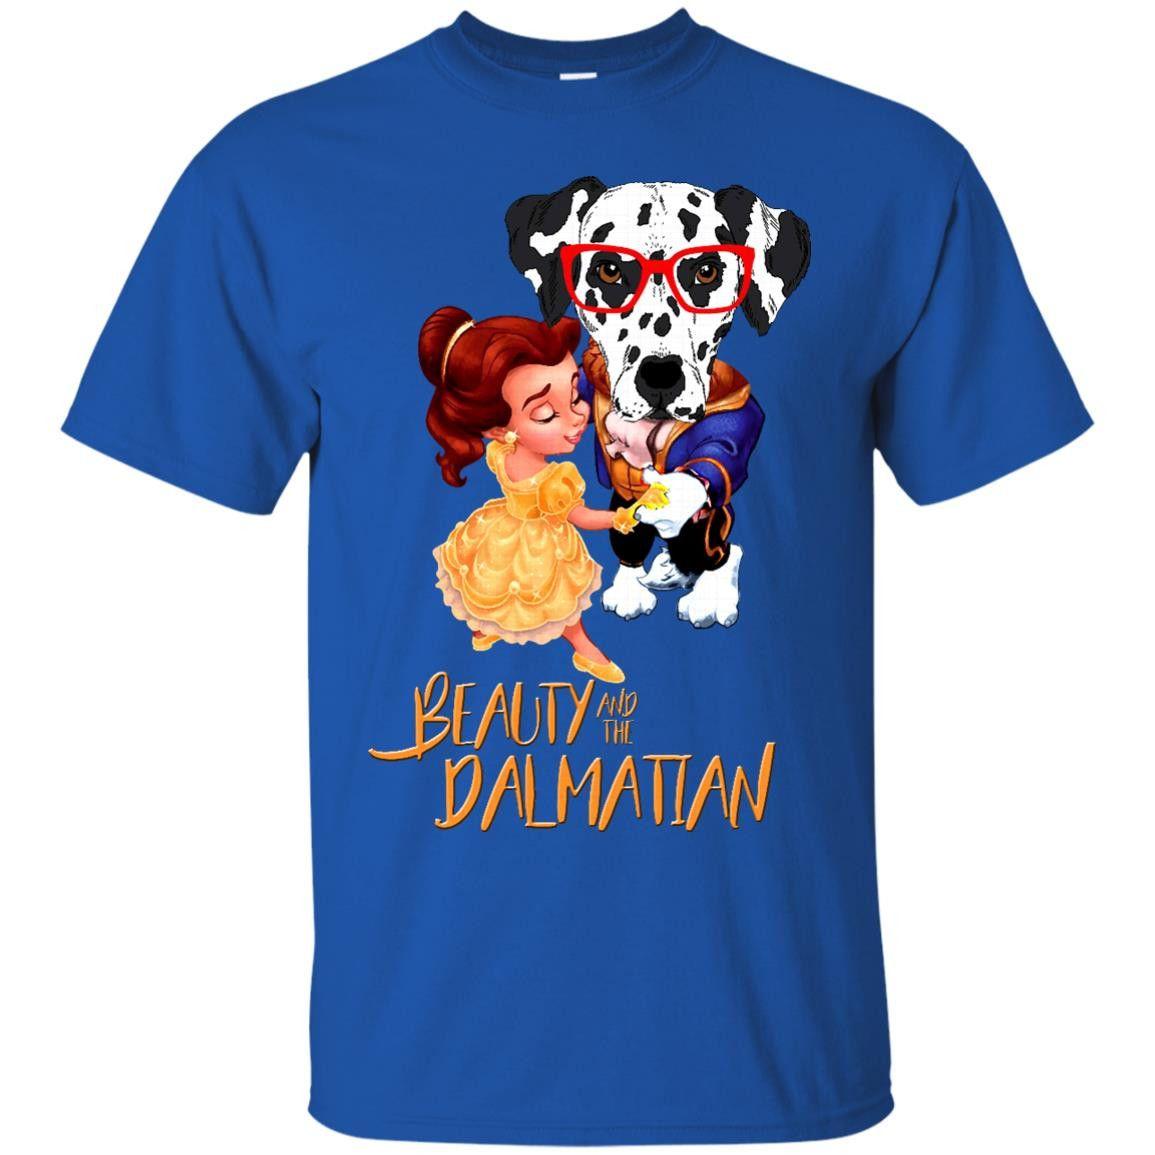 Beauty And The Beast Shirts Beauty And The Dalmatian T shirts Hoodies Sweatshirts